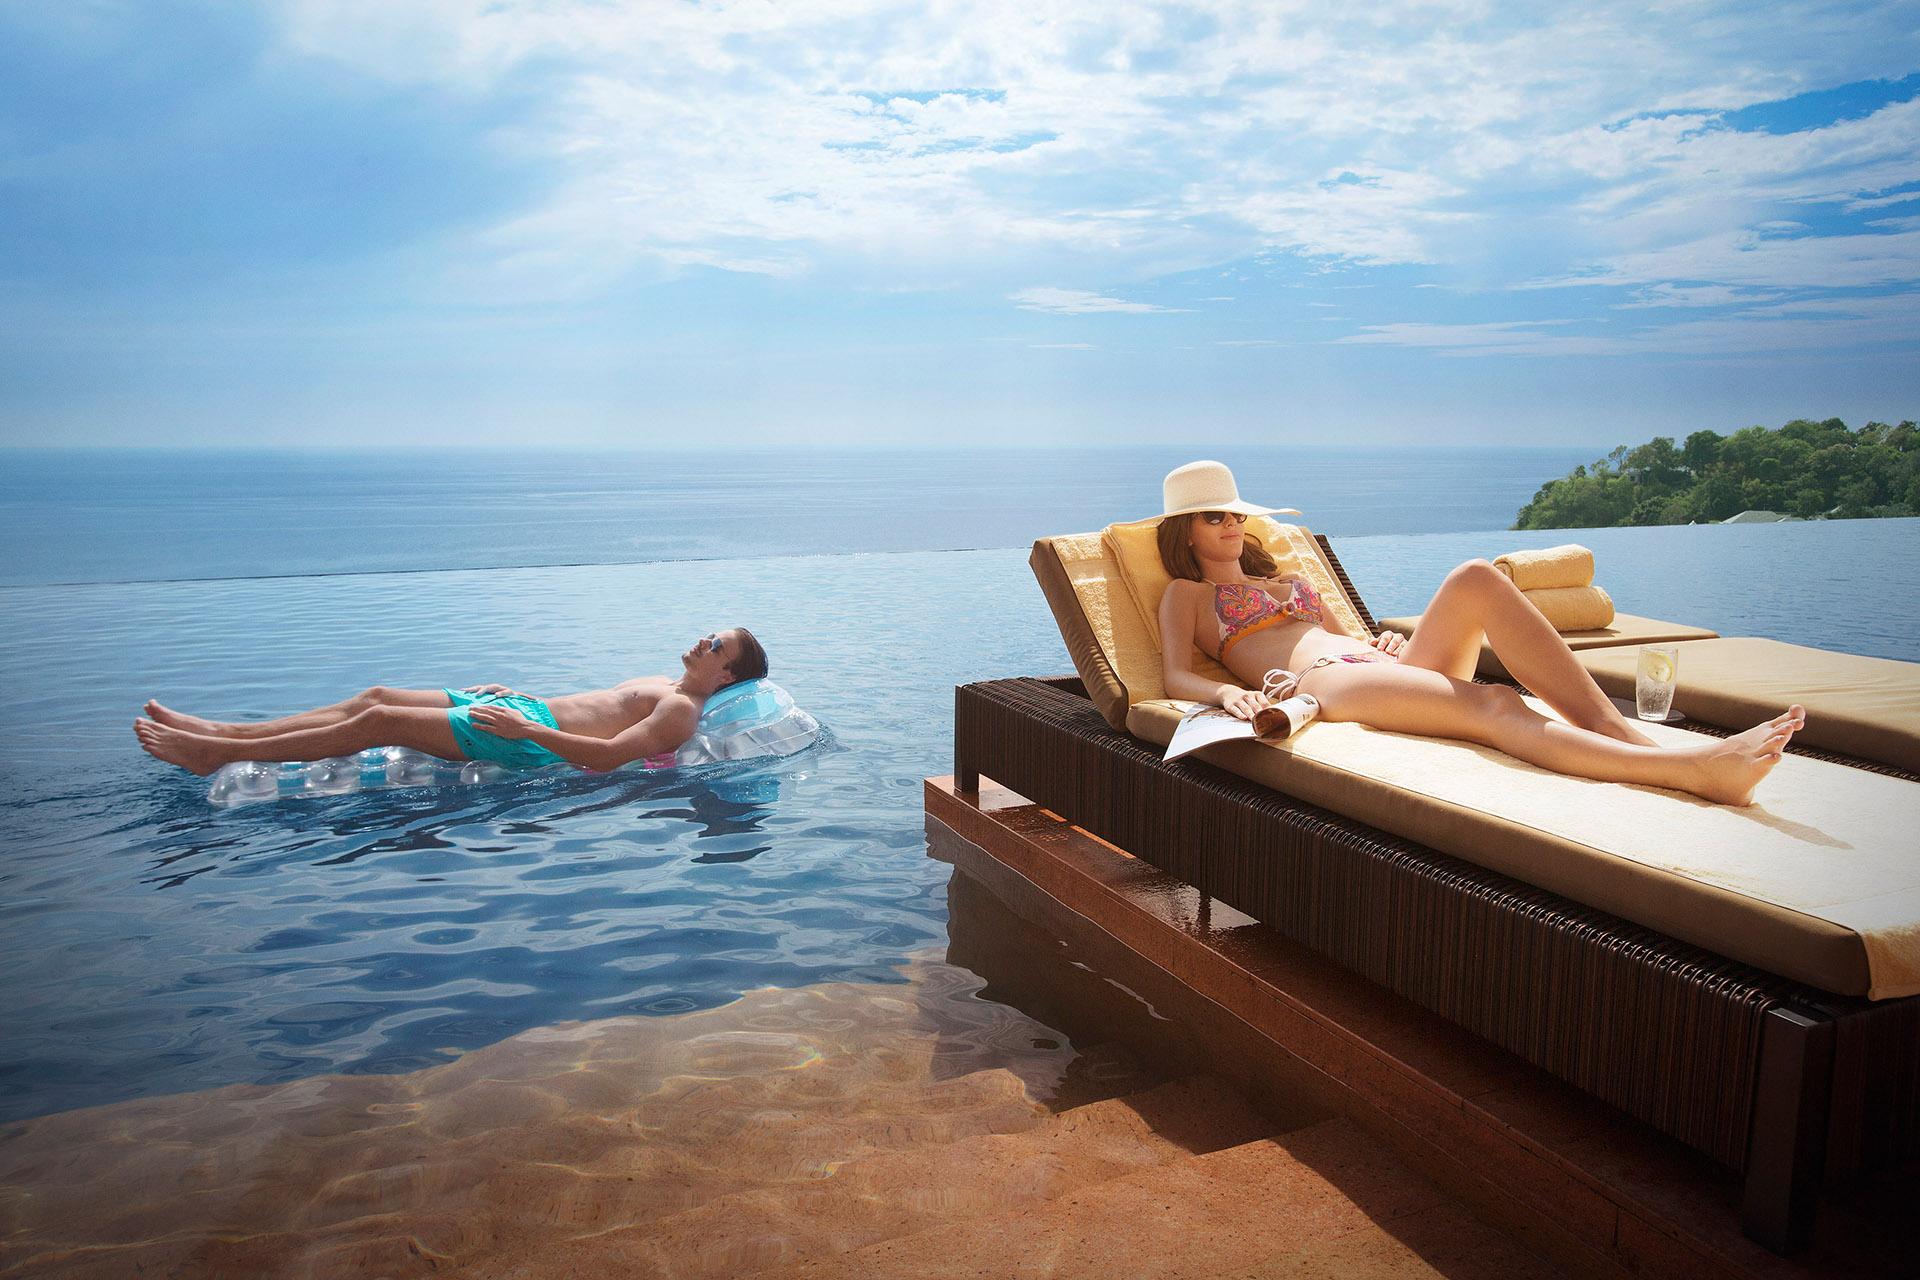 075 Visa-Thailand  Pool Bikini Caucasian 150515